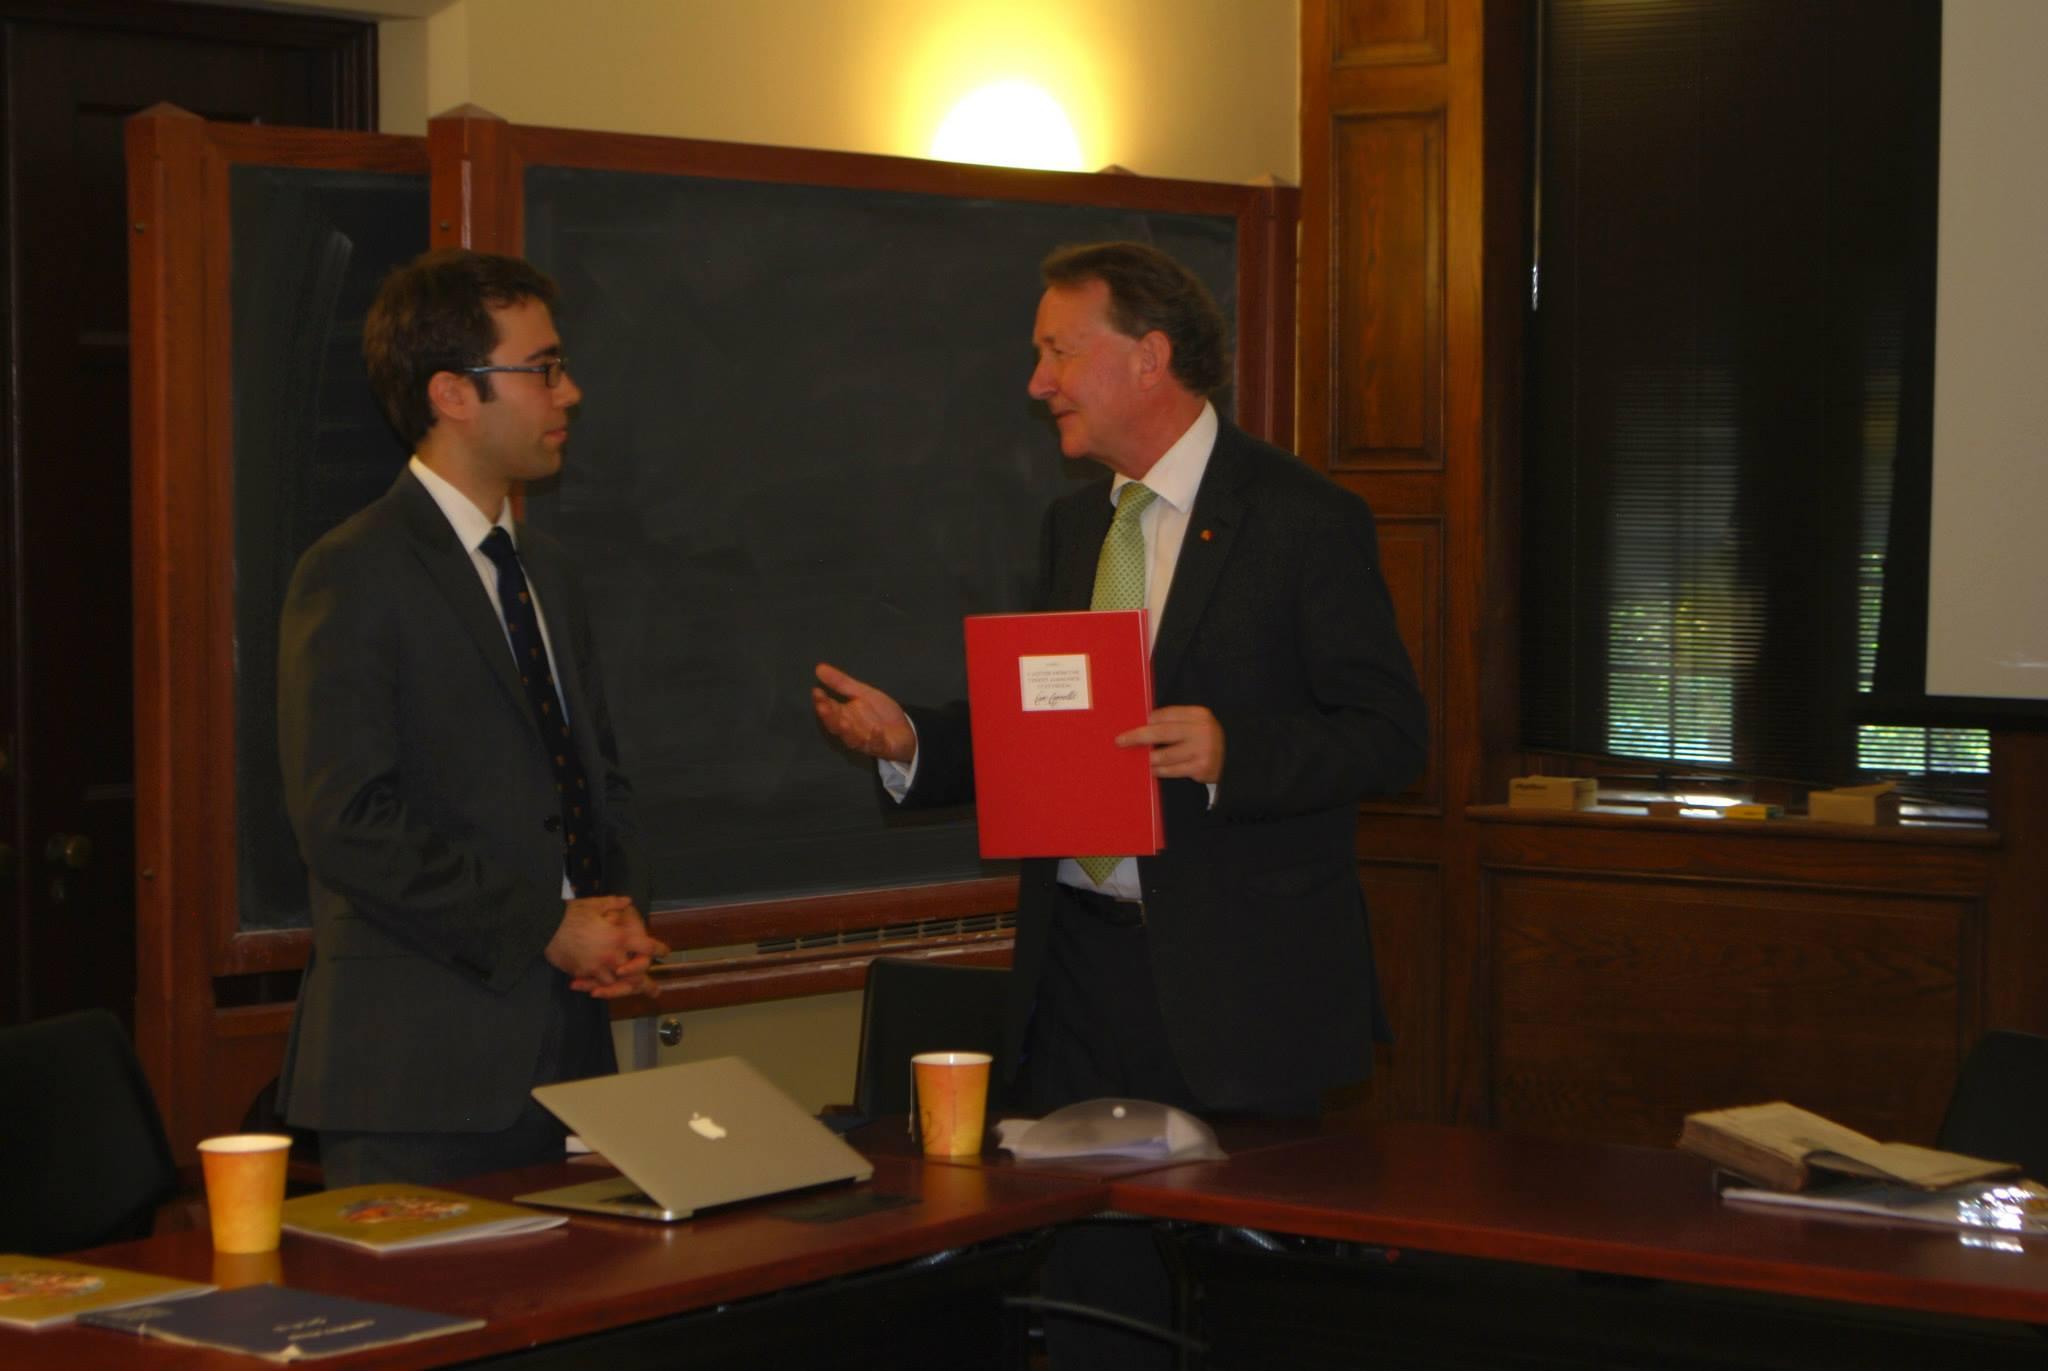 Lord David Alton and Michael Breidenbach at Princeton University